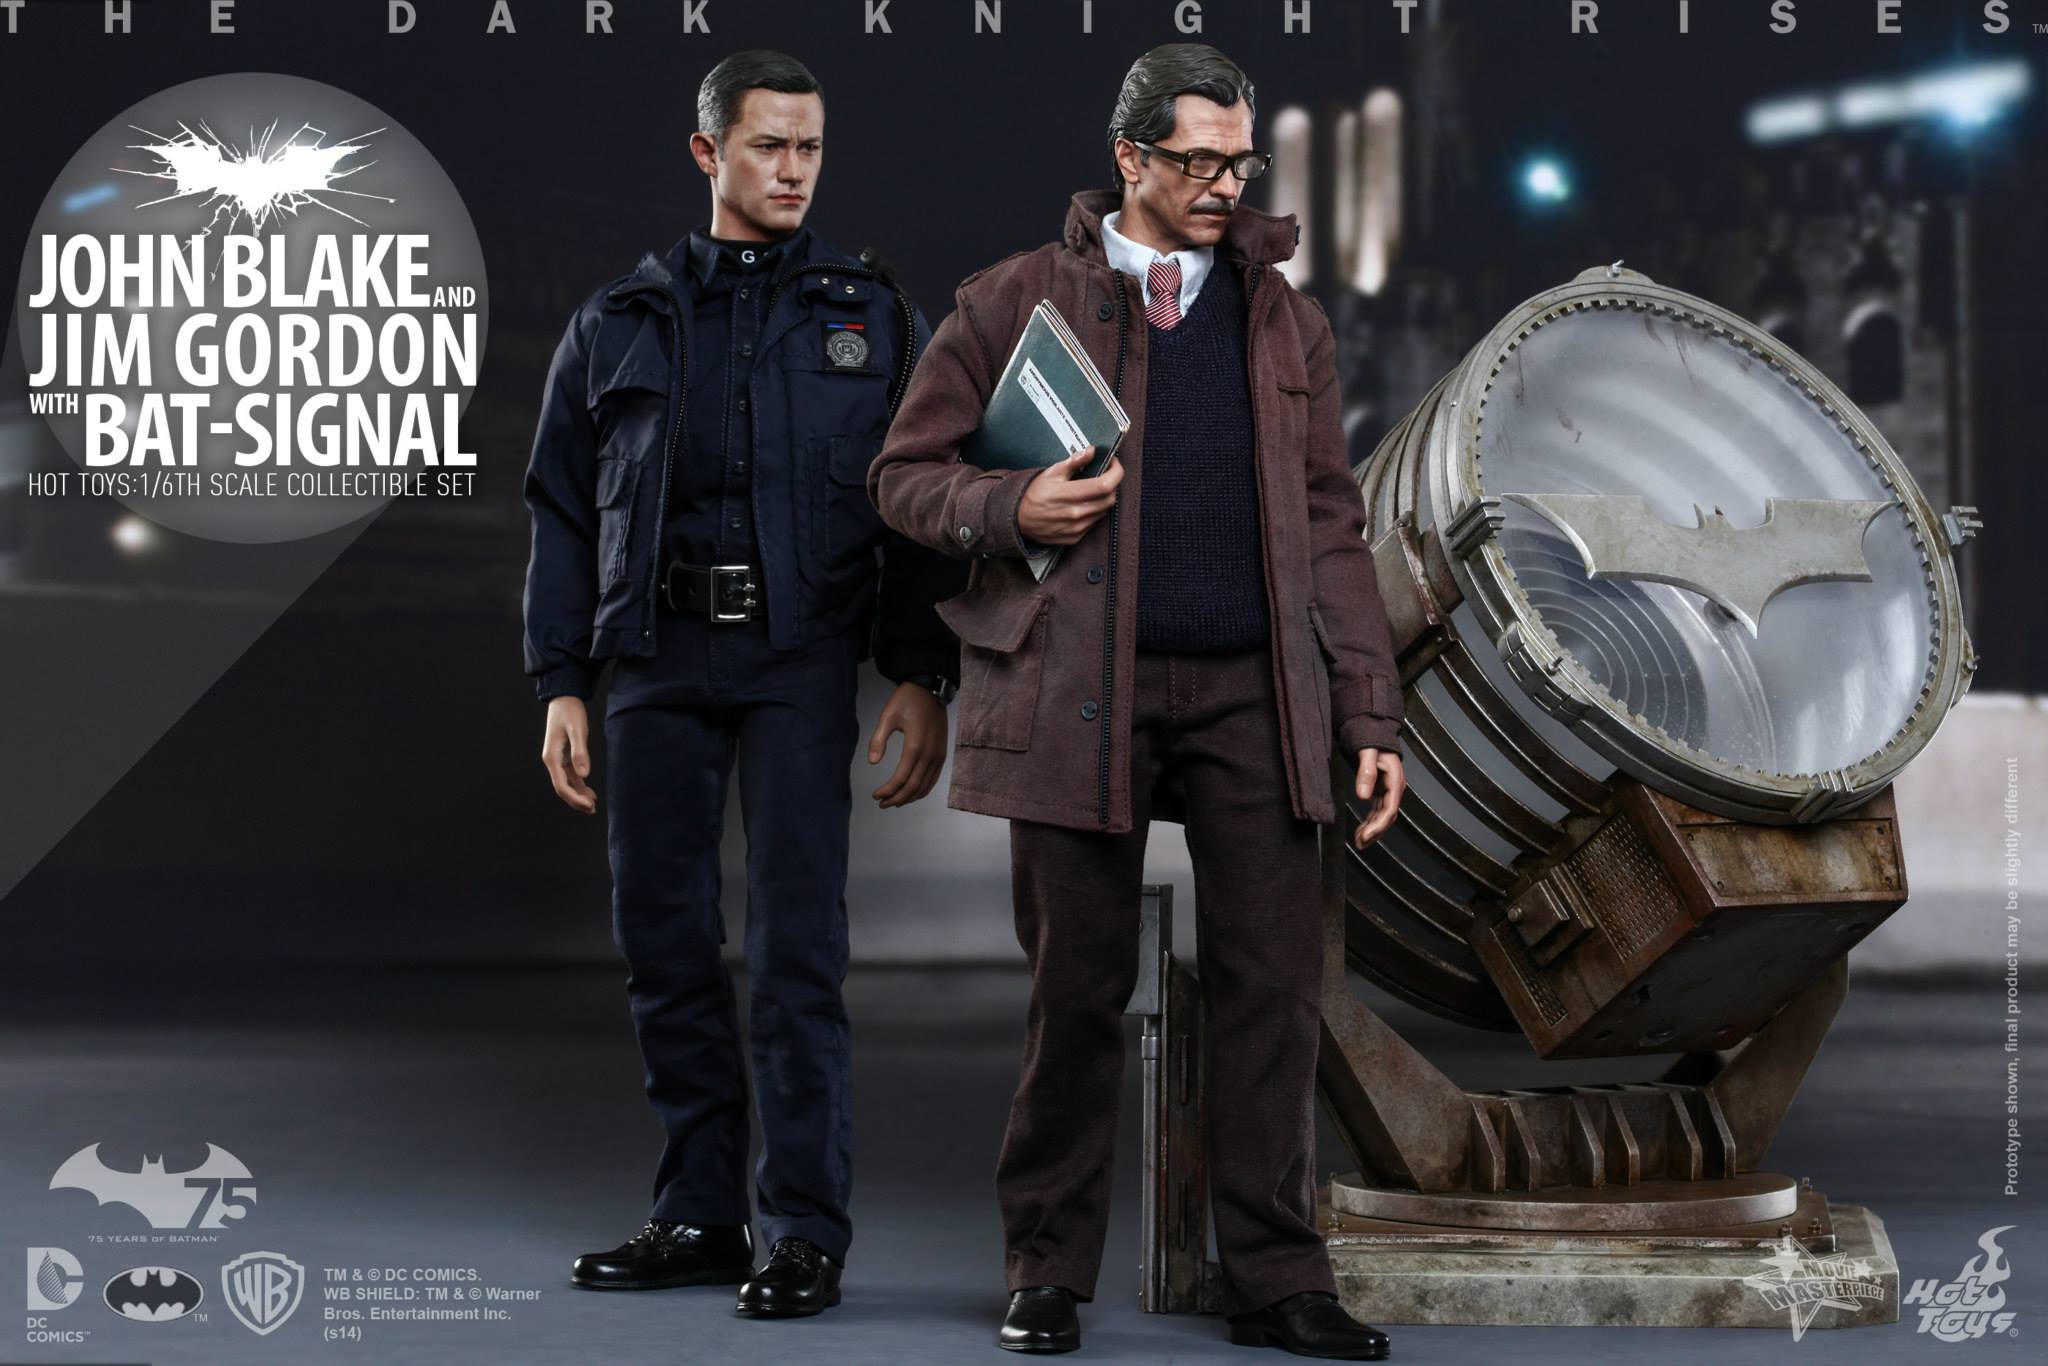 THE DARK KNIGHT RISES - Lt. JIM GORDON & JOHN BLAKE w/BATSIGNAL 806915103